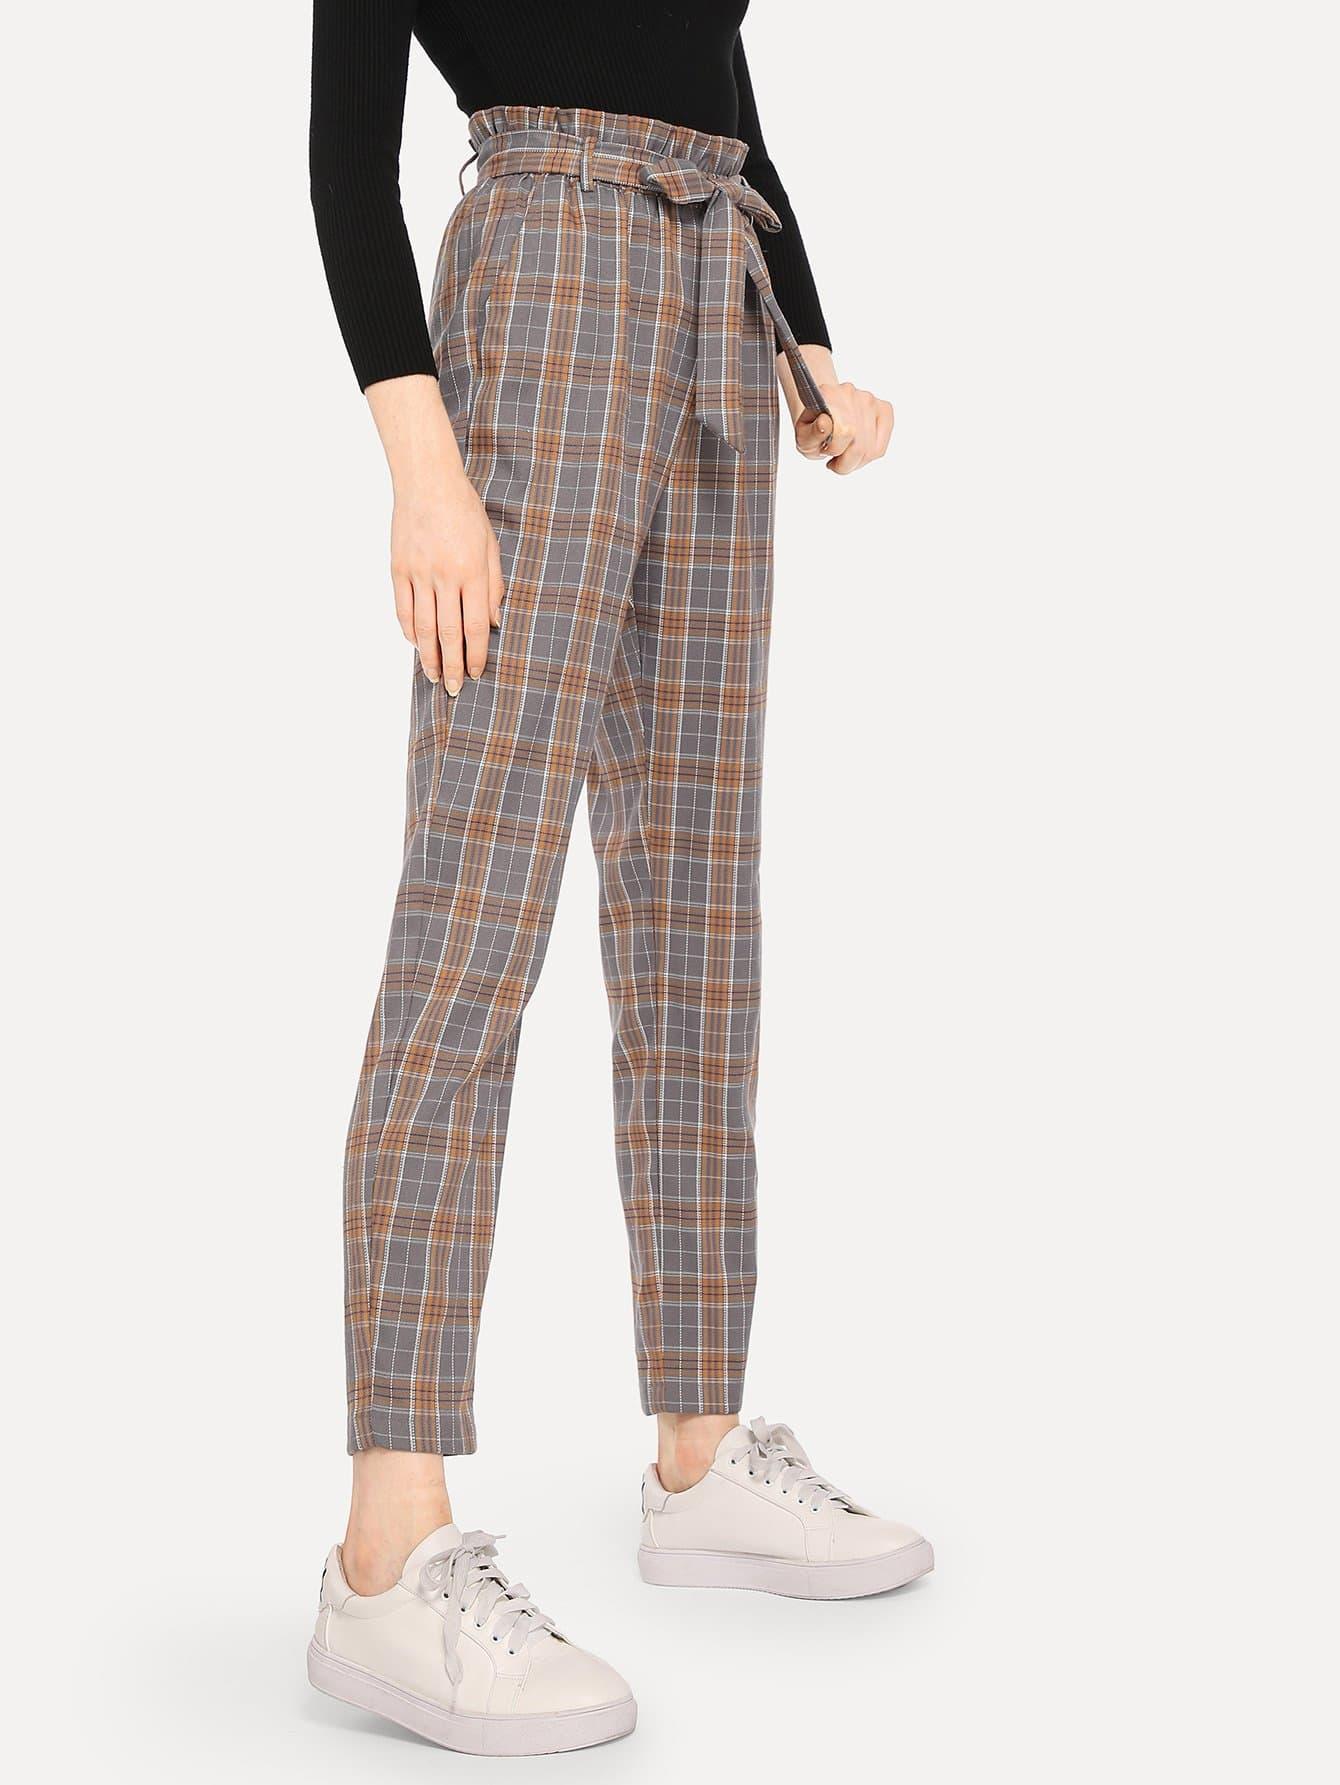 pantalon carreaux bord pliss avec n ud papillon french shein sheinside. Black Bedroom Furniture Sets. Home Design Ideas